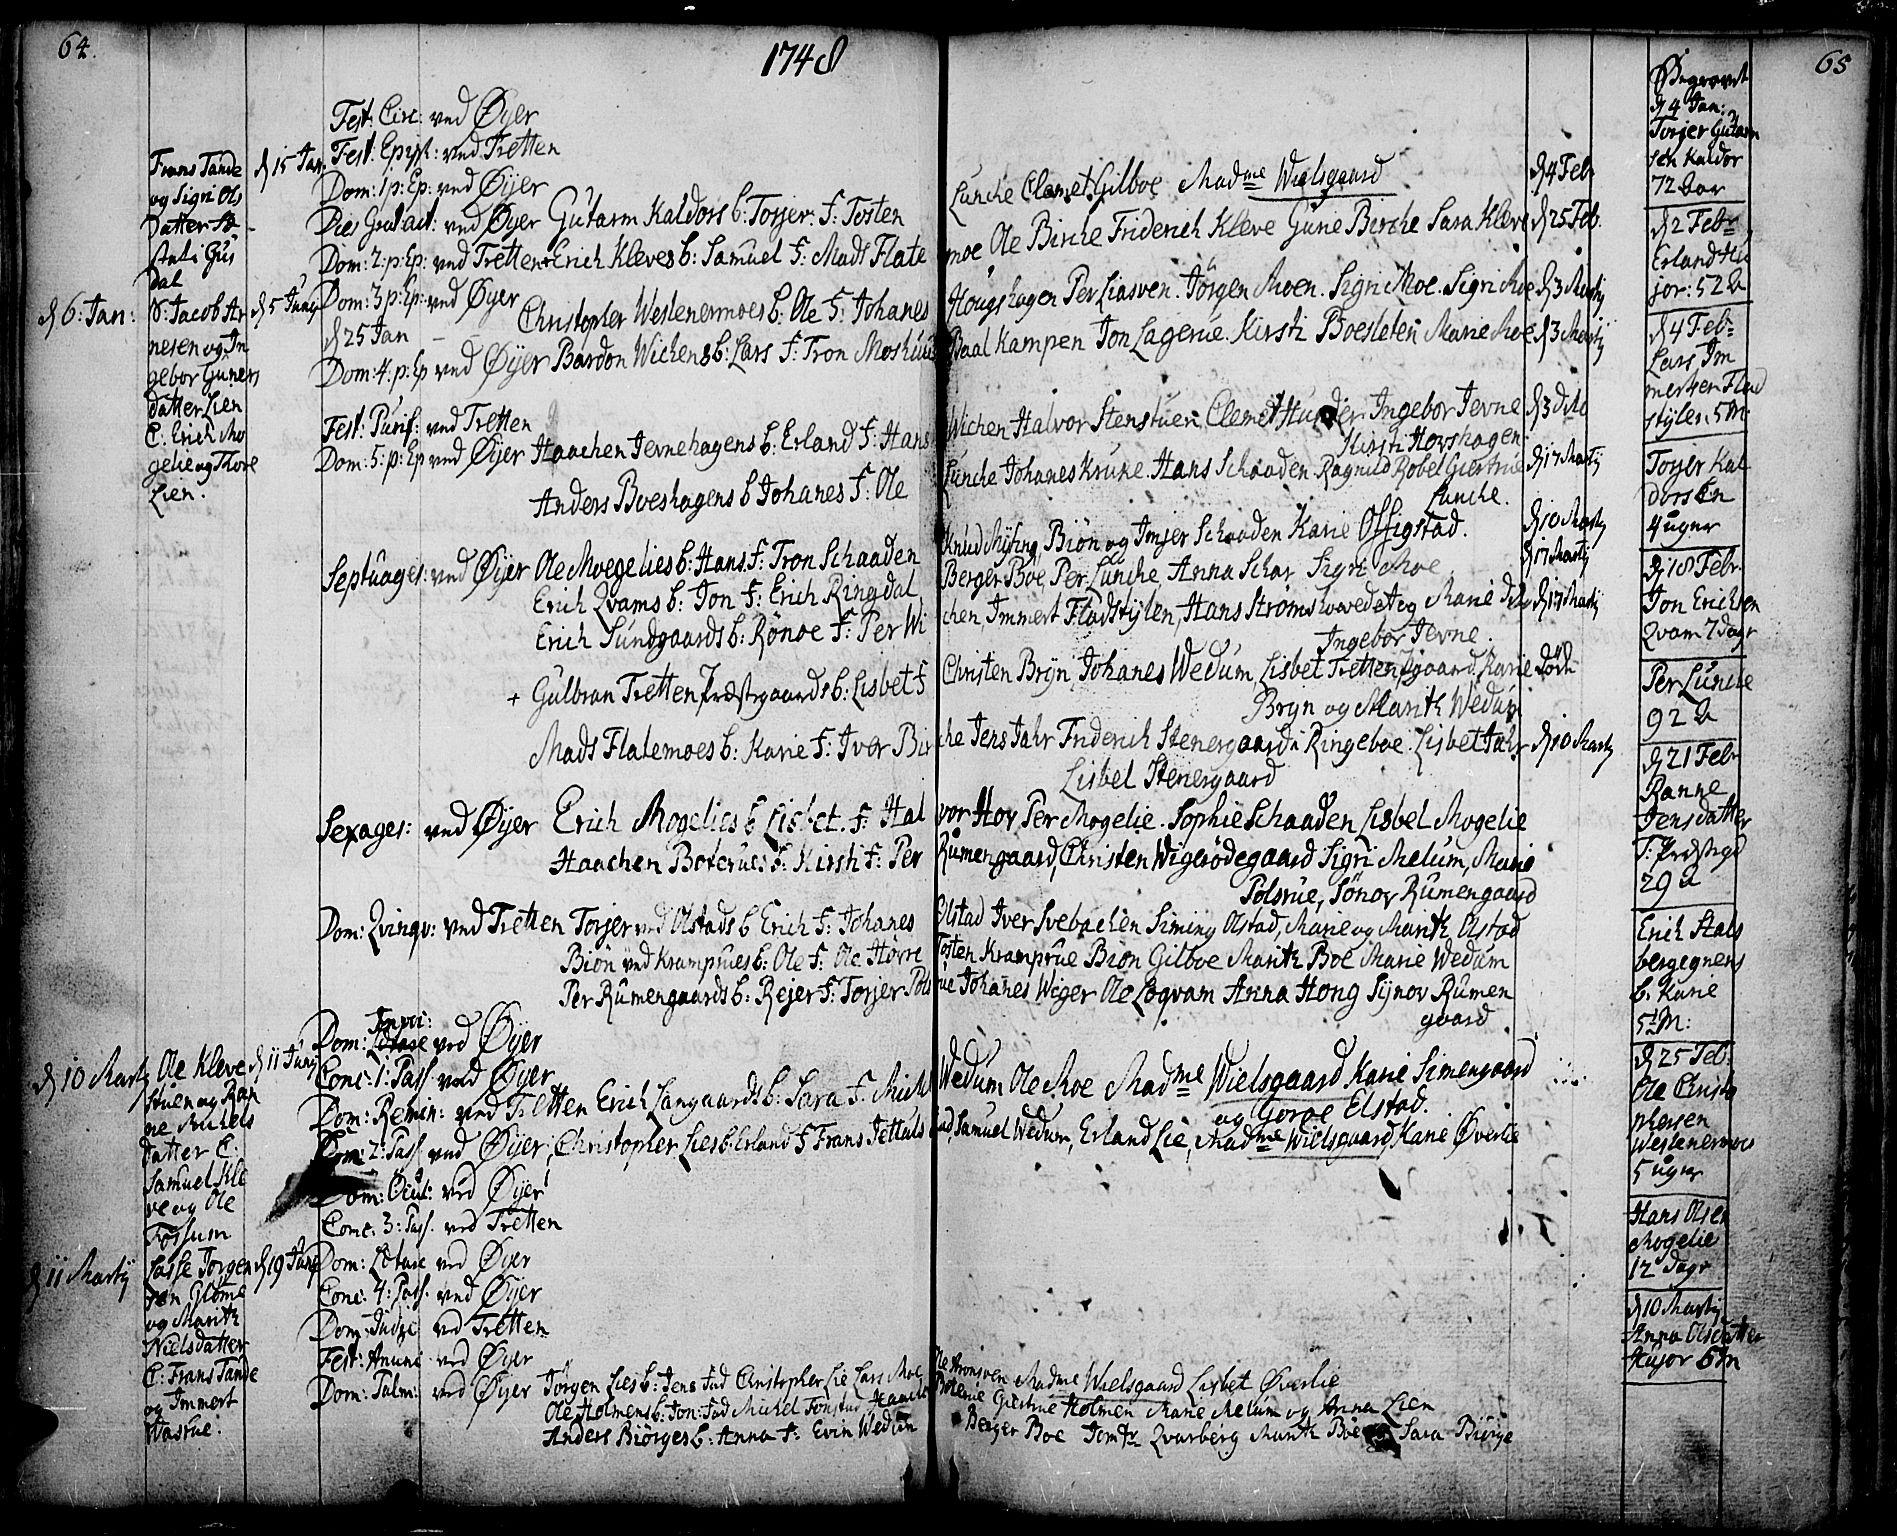 SAH, Øyer prestekontor, Ministerialbok nr. 2, 1733-1784, s. 64-65